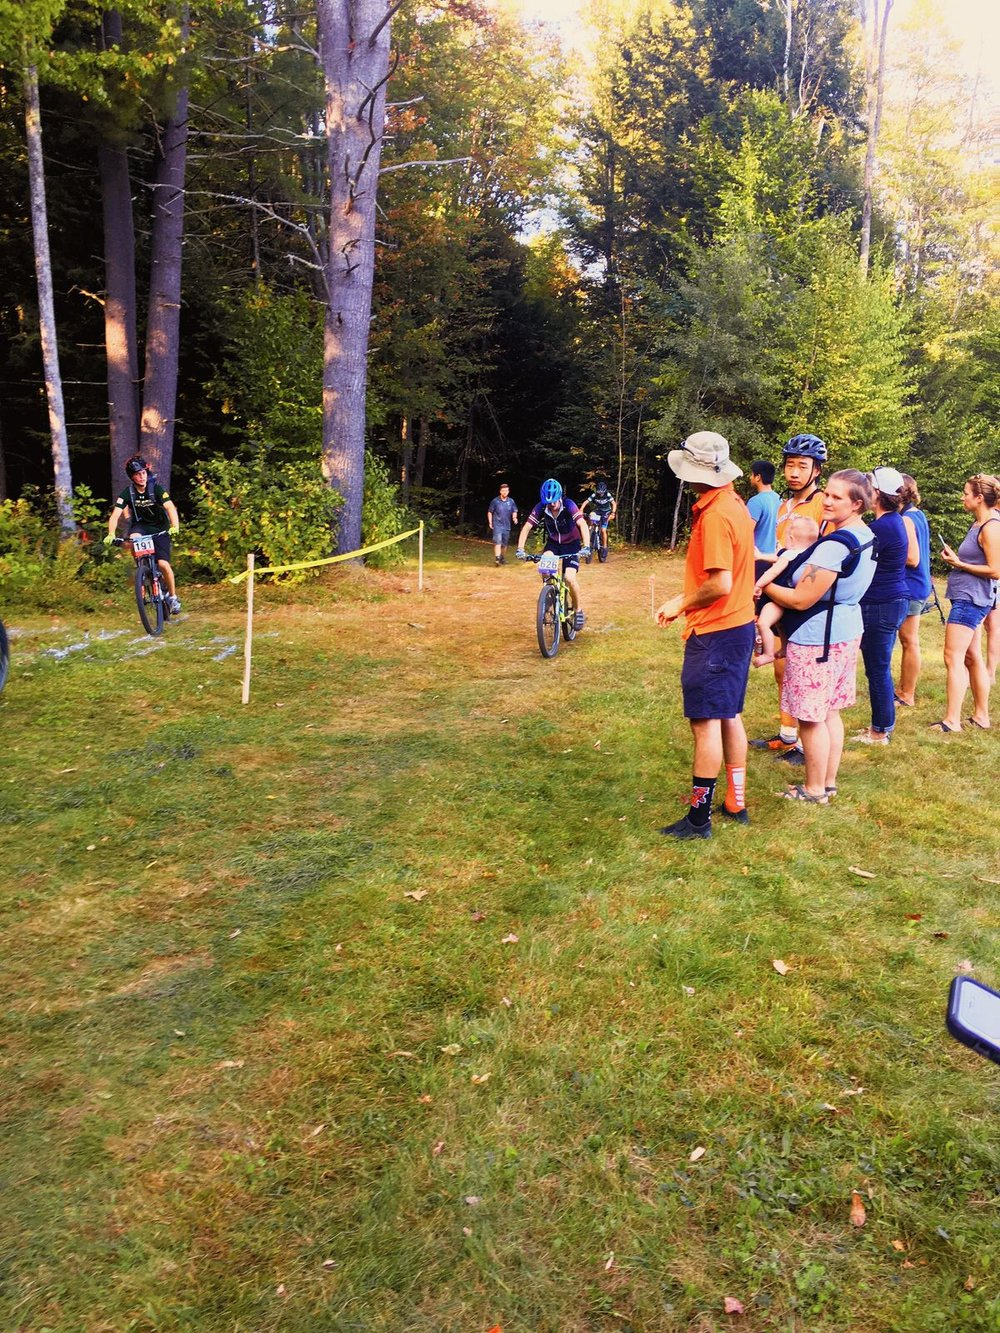 Mountain Biking at Vermont Academy - September 27, 2017  - 7969.JPG